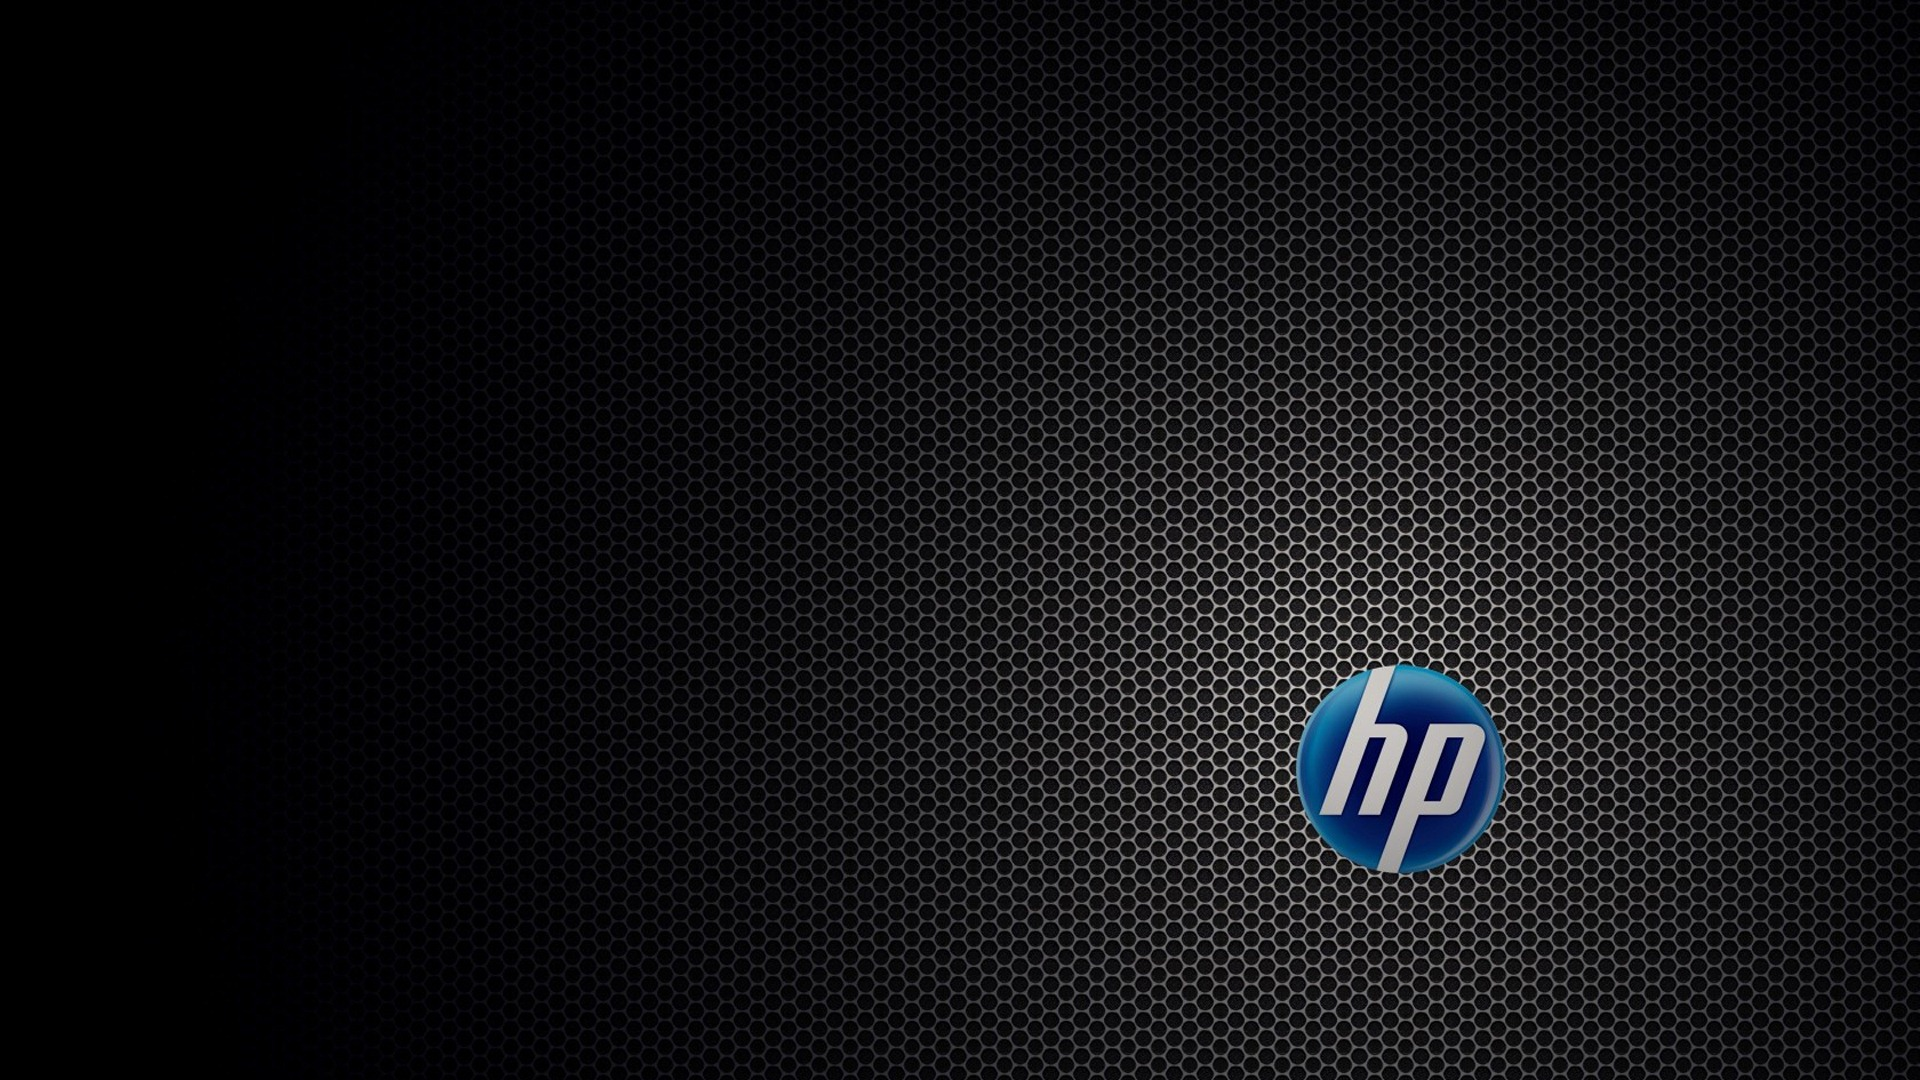 HP Wallpaper 1920x1080